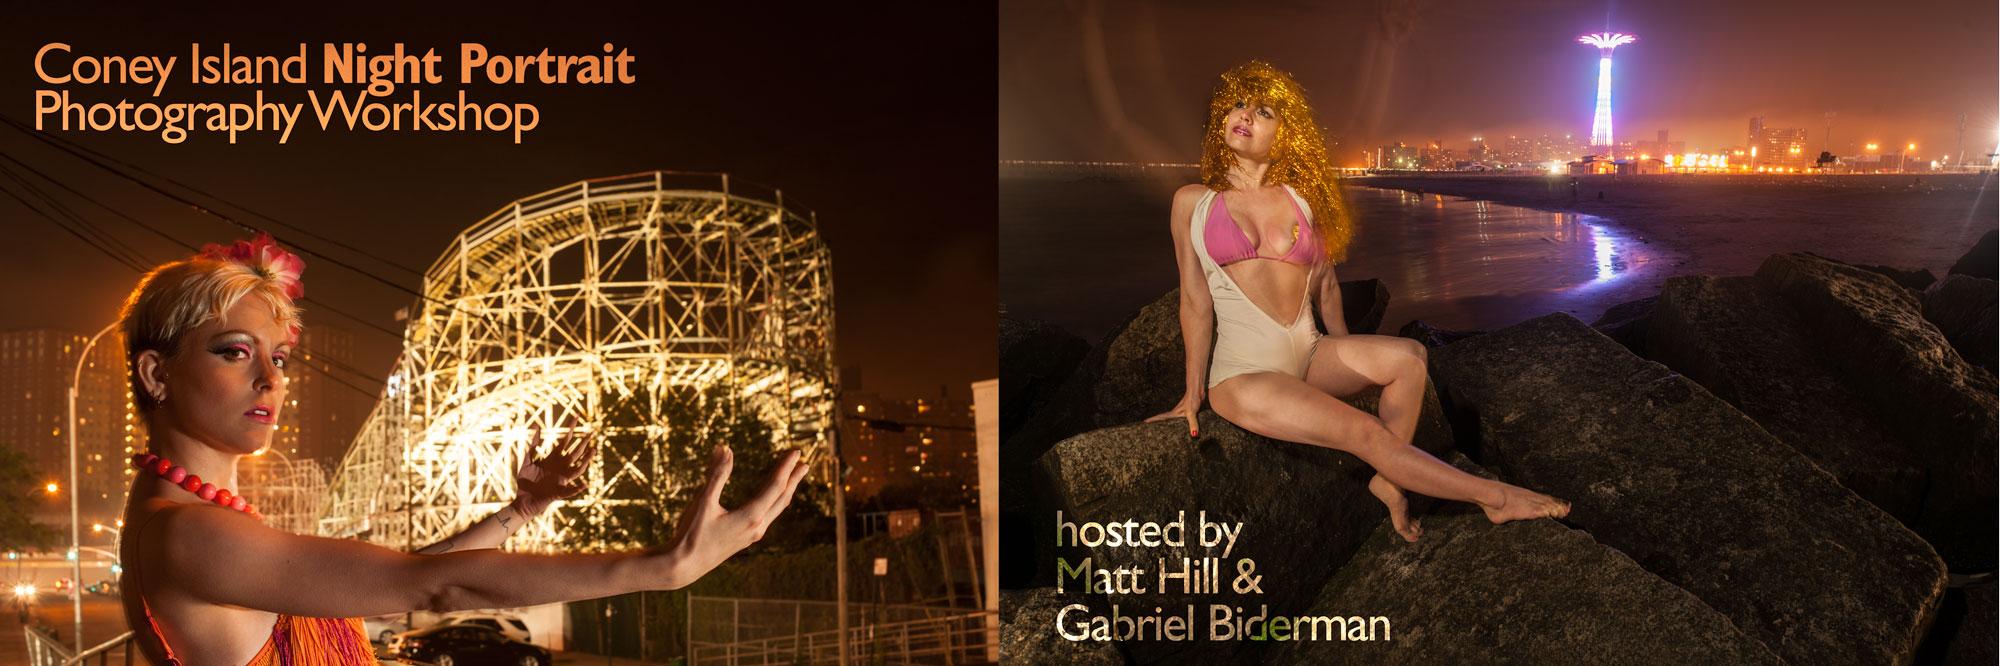 coney-island-night-portrait-photography-workshop.jpg